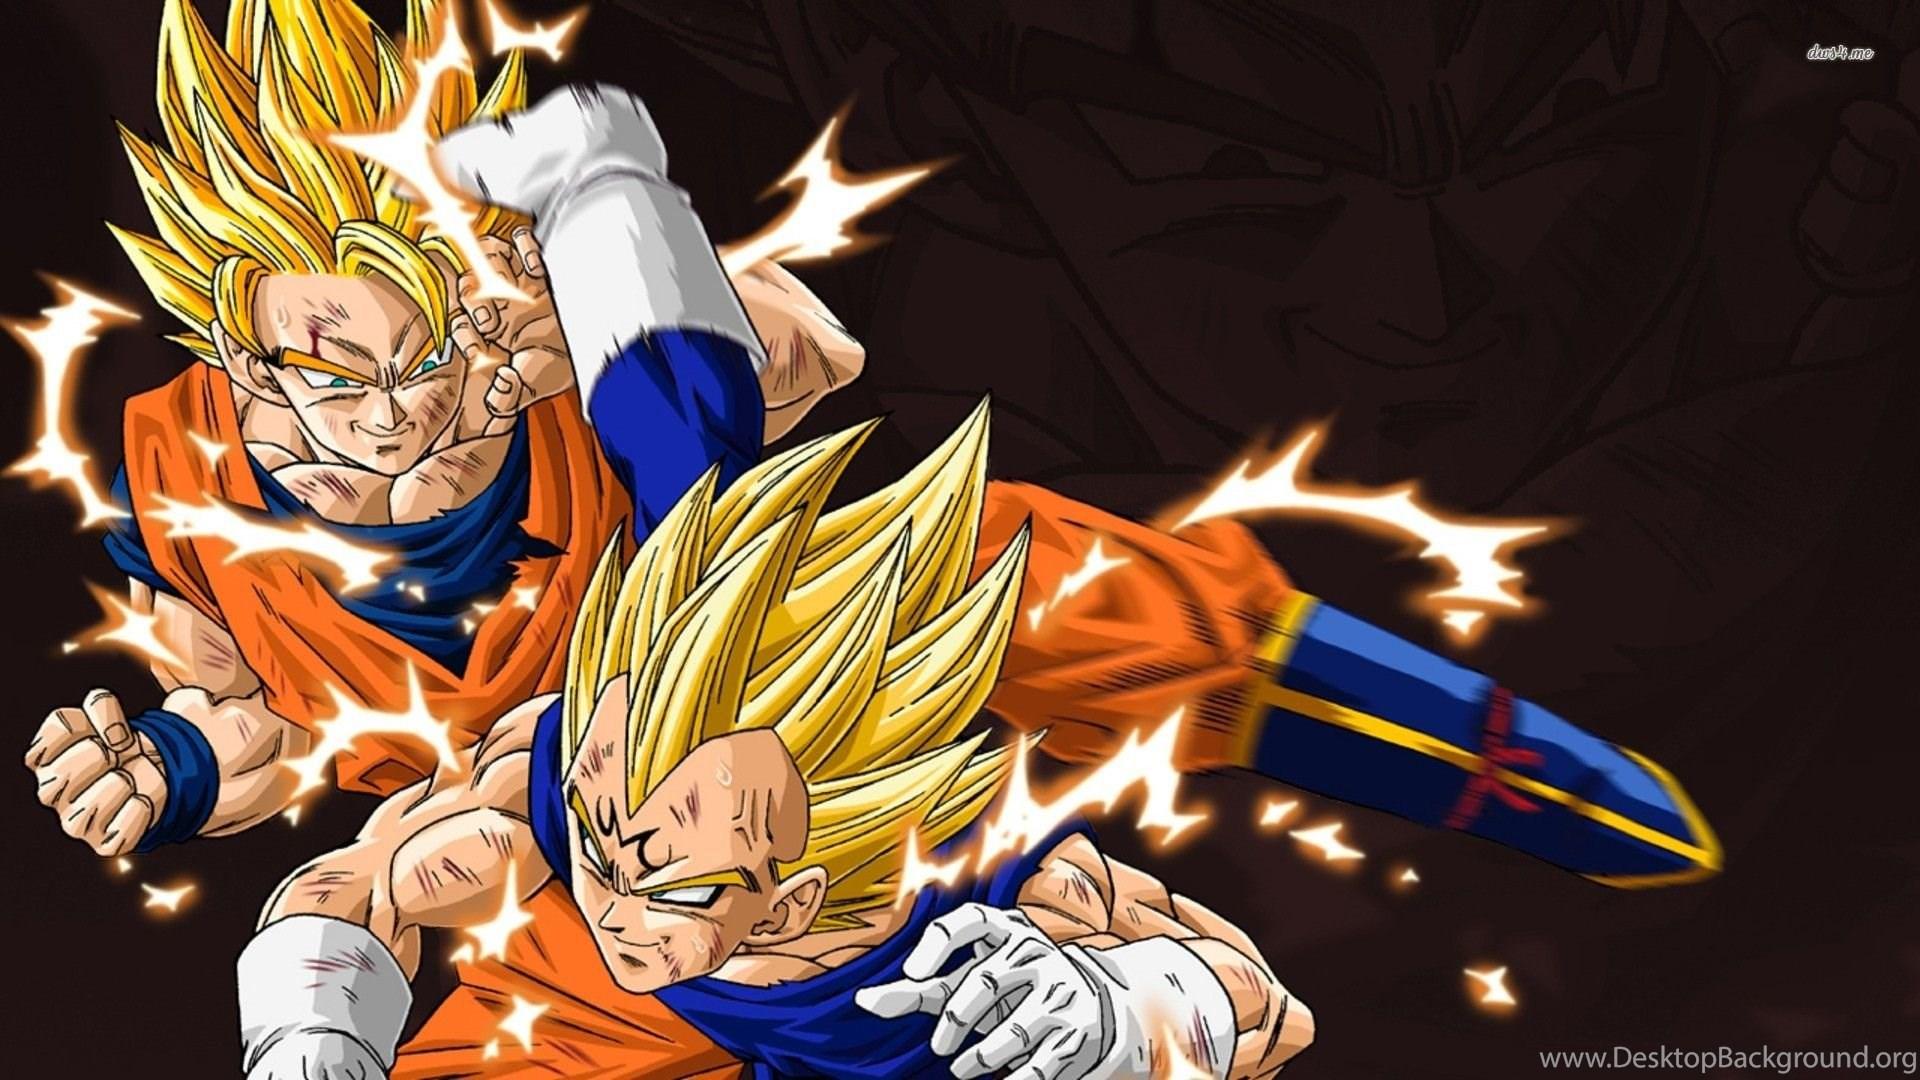 Dragon Ball Z Vegeta Wallpapers Mobile Desktop Background